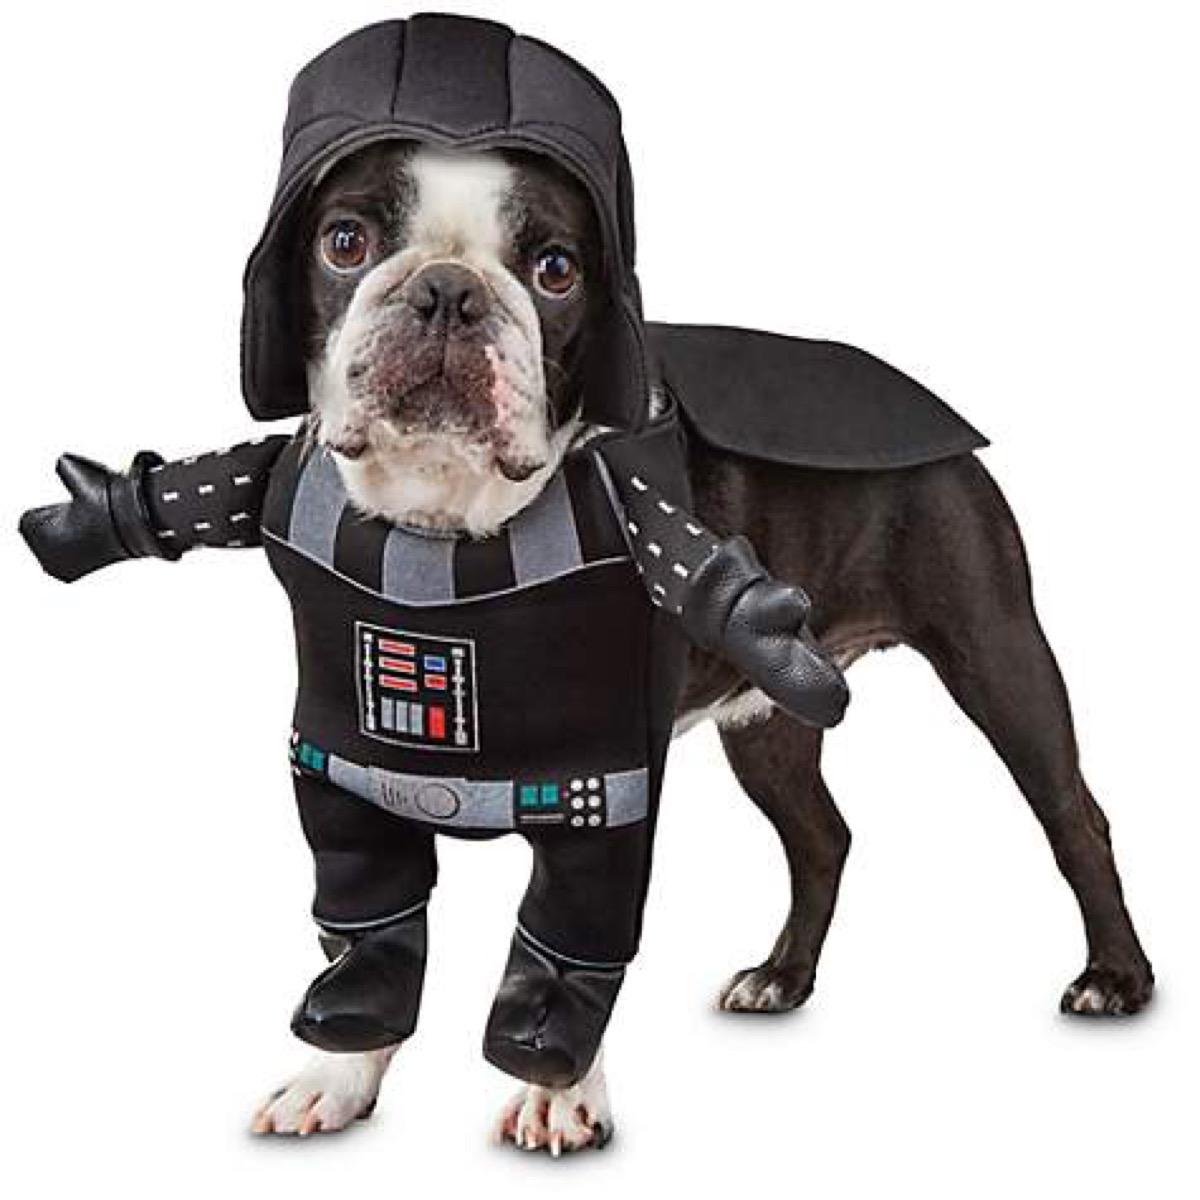 dog in darth vader costume, dog halloween costumes